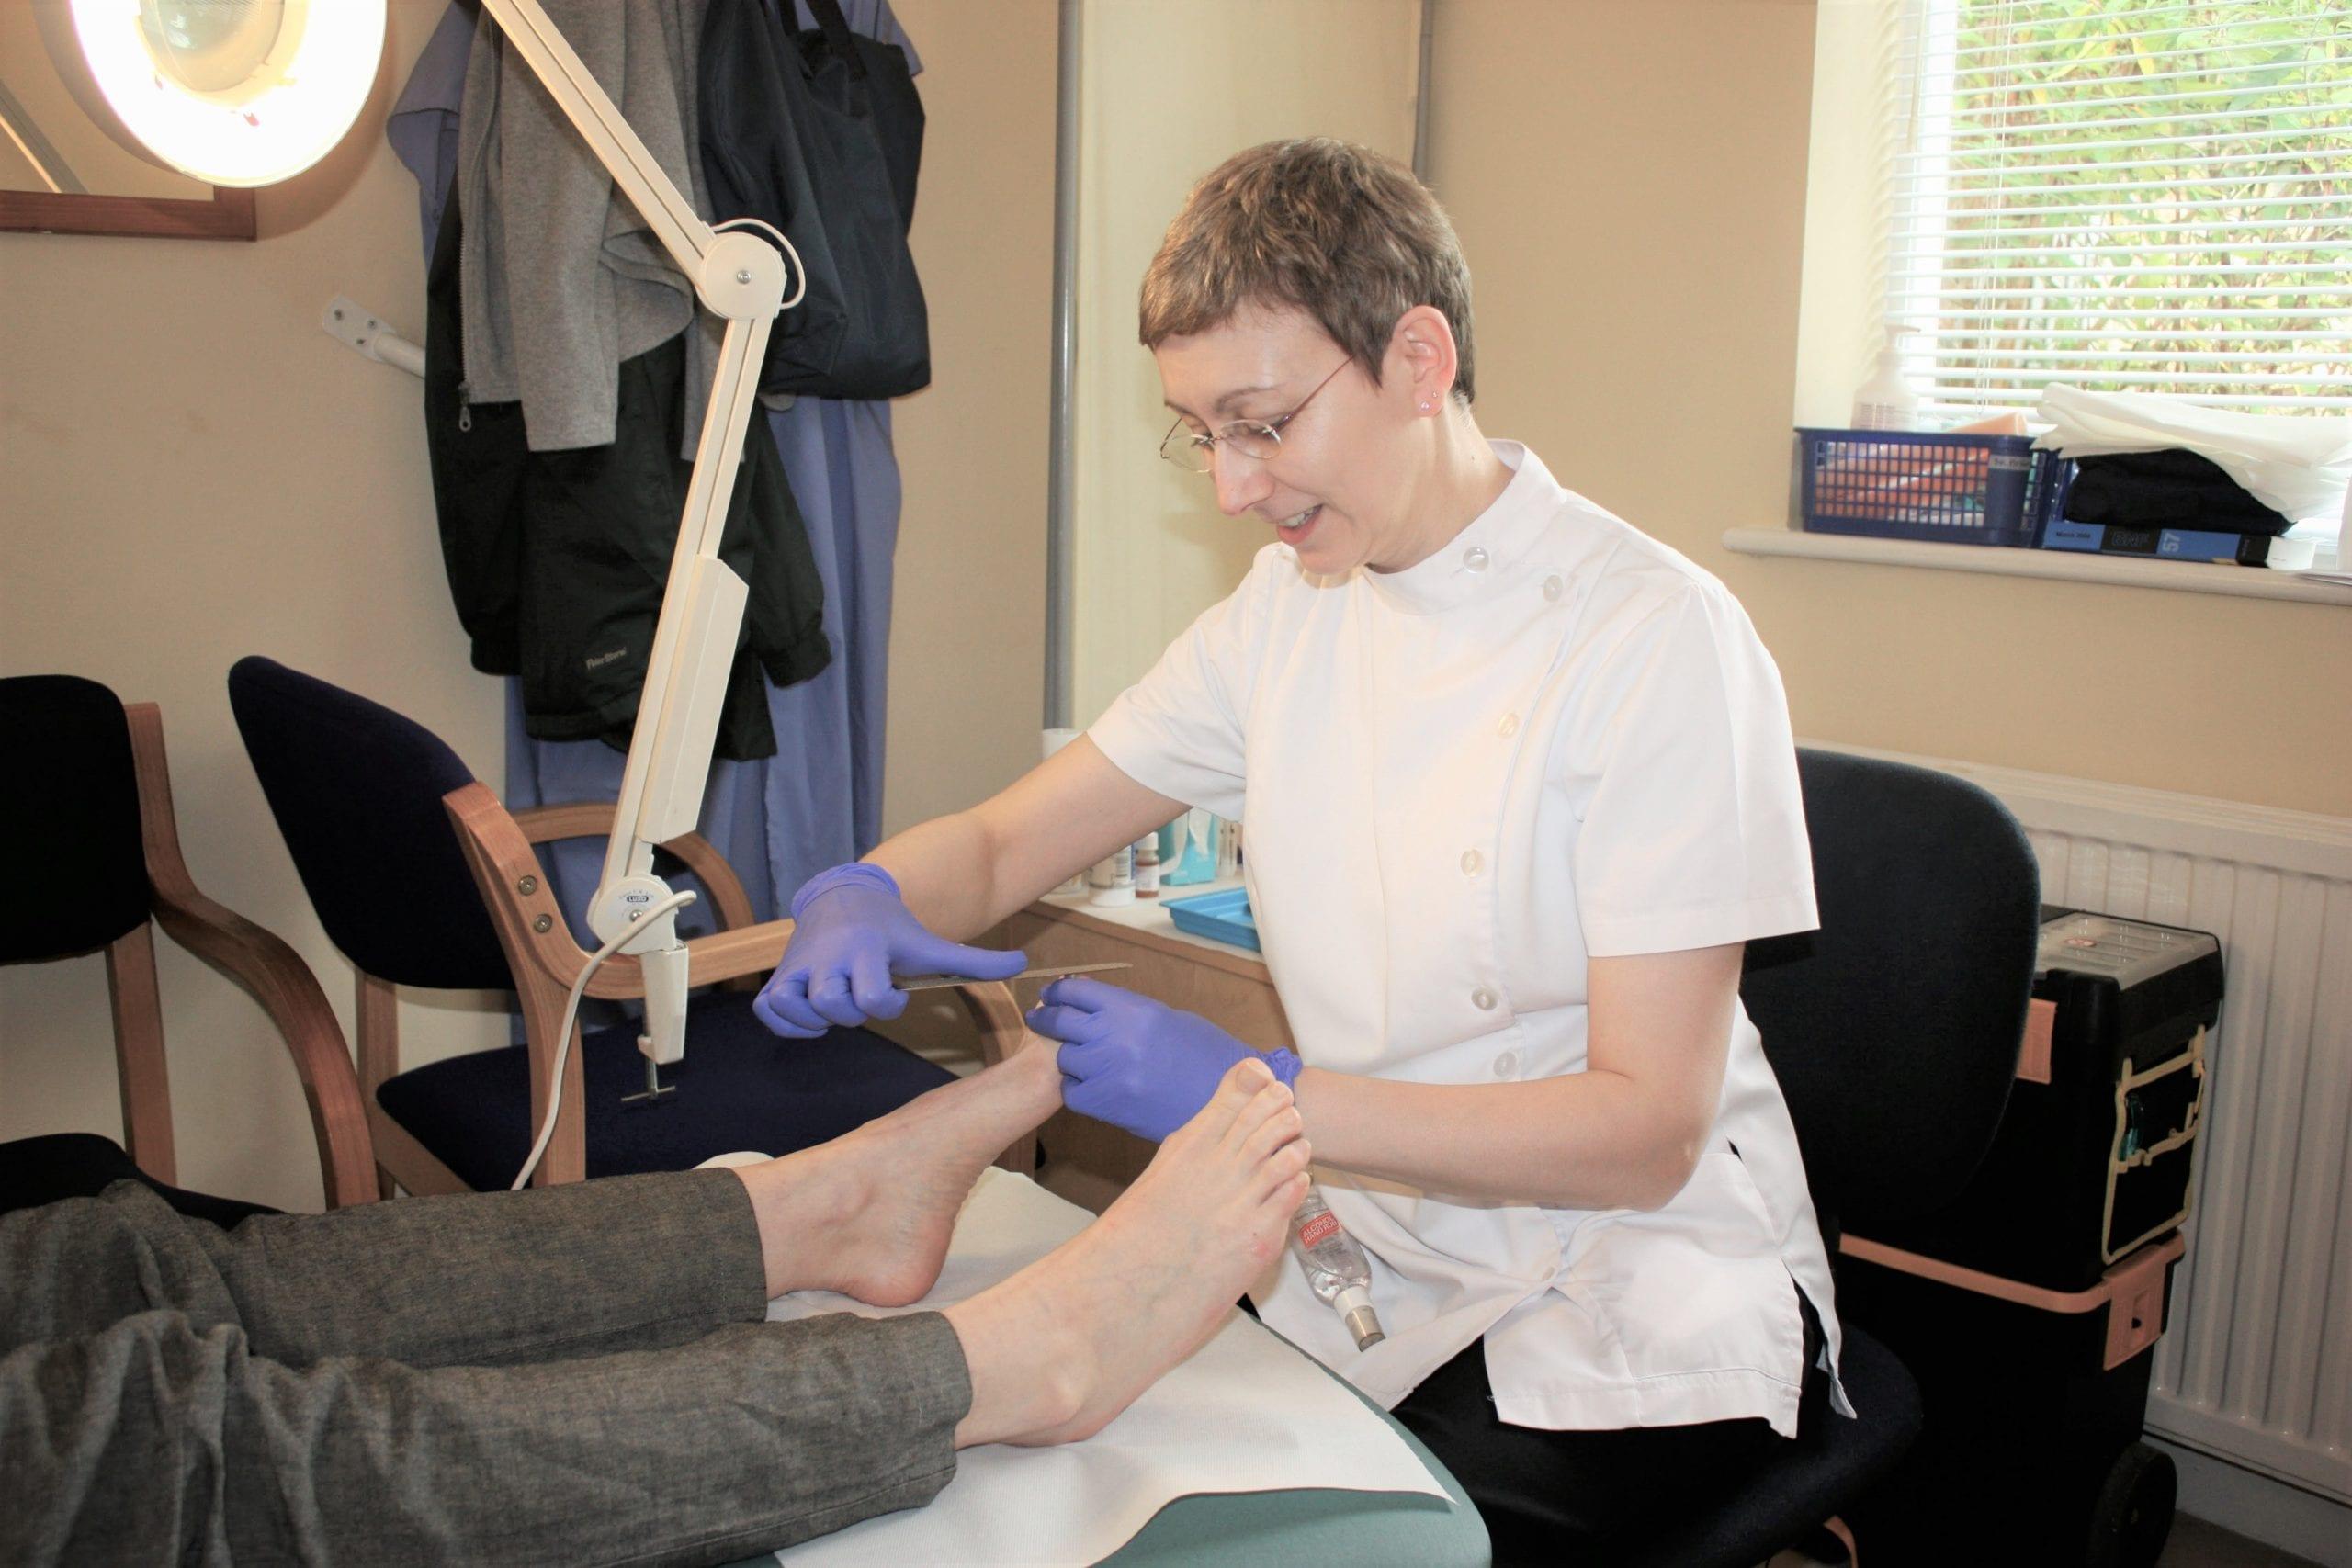 Photo of Sue Beynon summertown Clinic's podiatrist at work